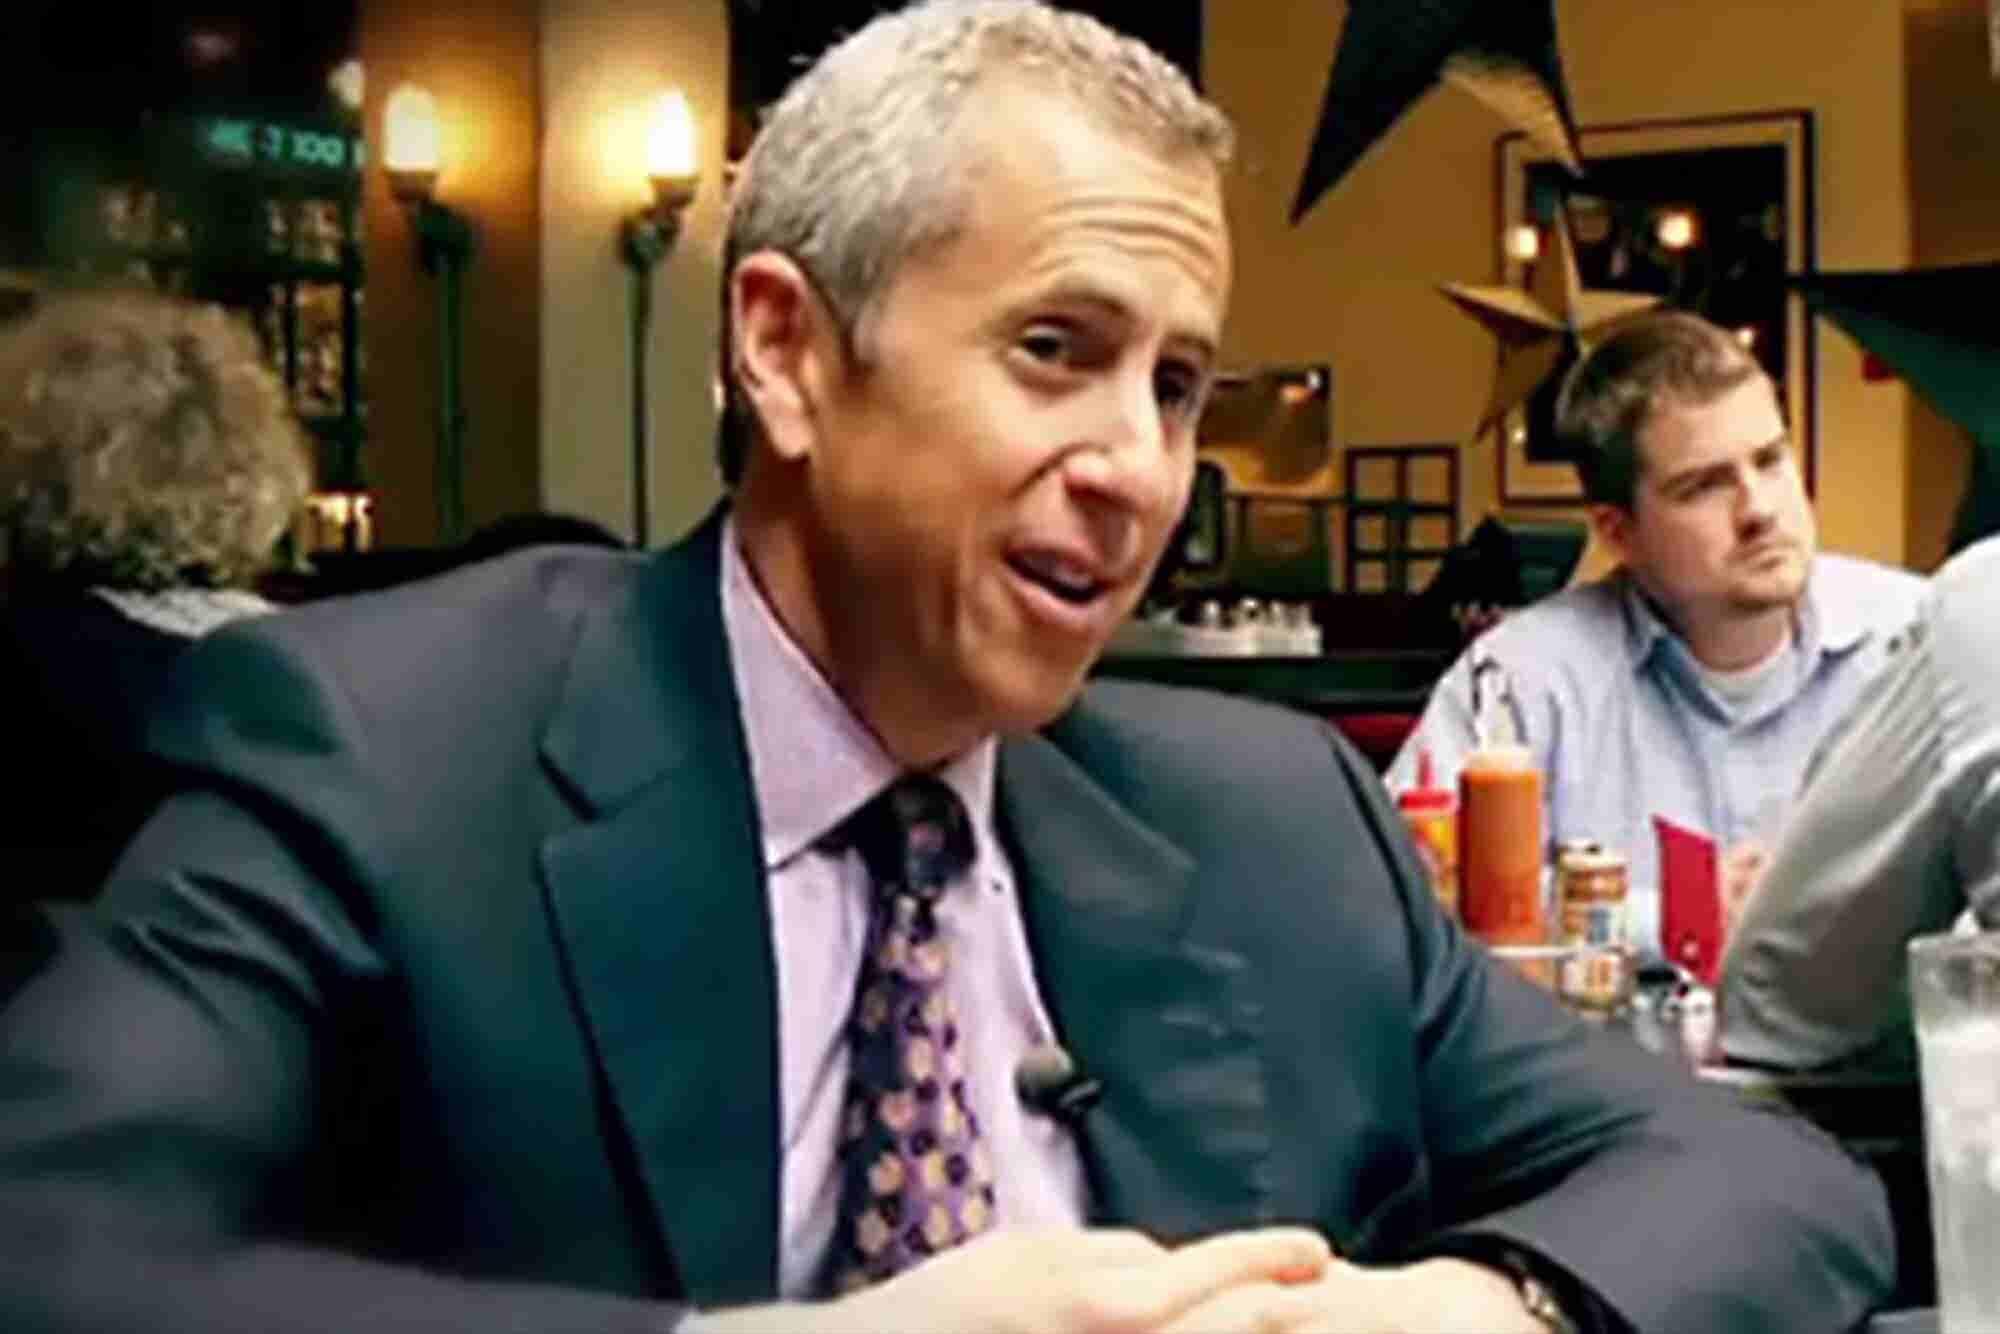 The Innovators: Union Square Hospitality Group's Danny Meyer